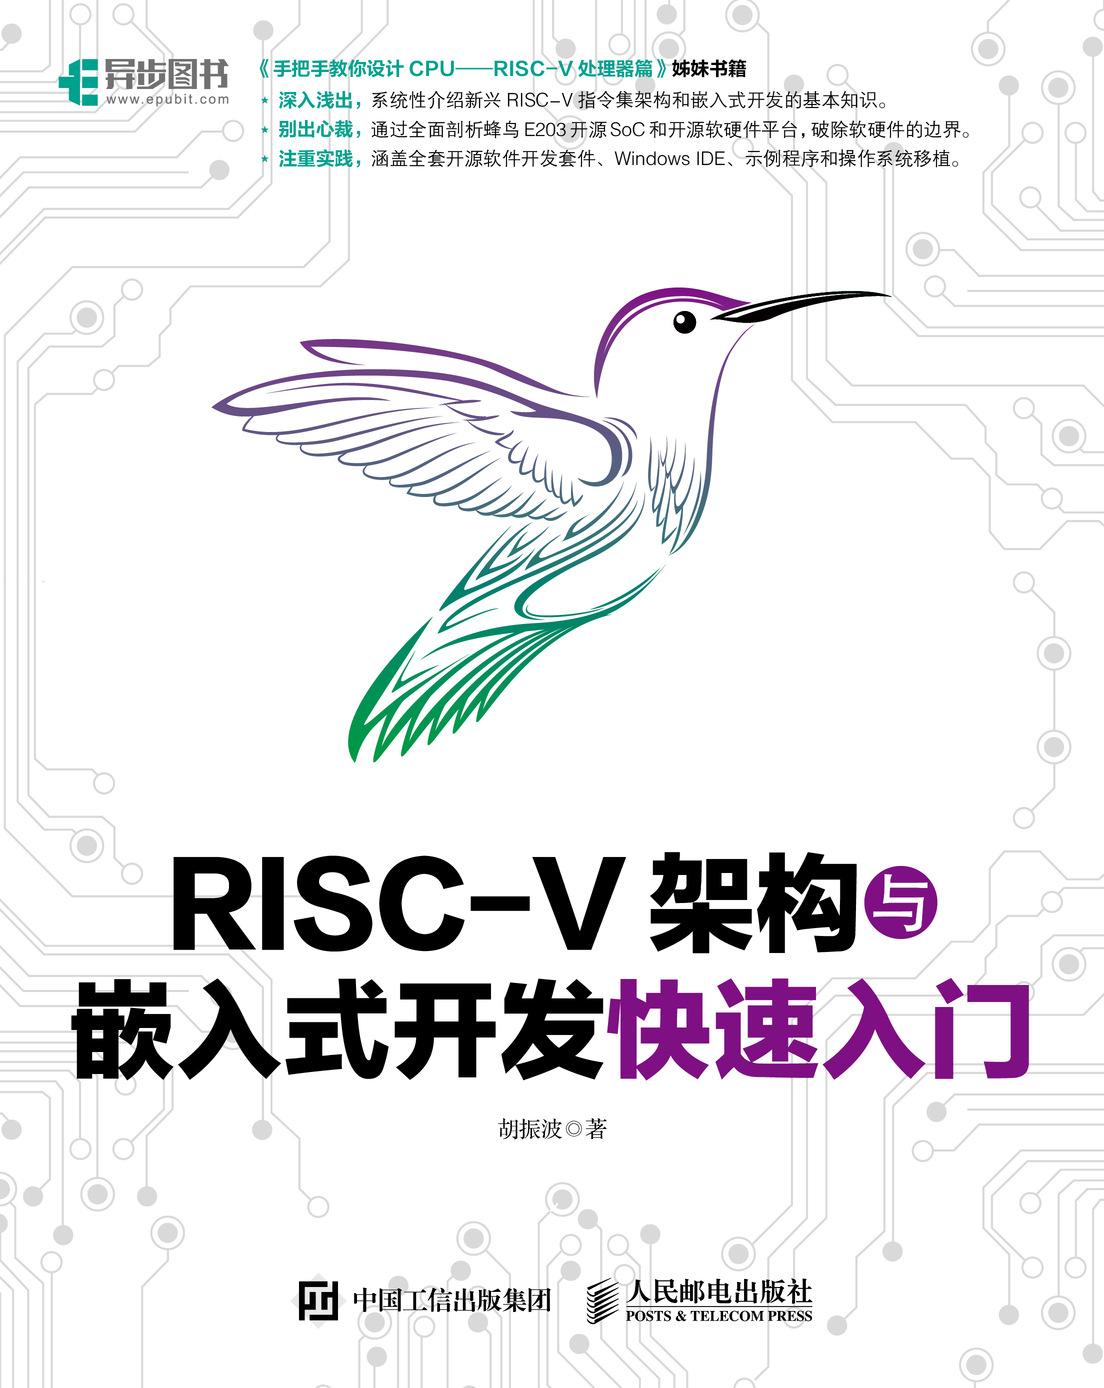 RISC-V架构与嵌入式开发快速入门 PDF格式高清电子书免费下载